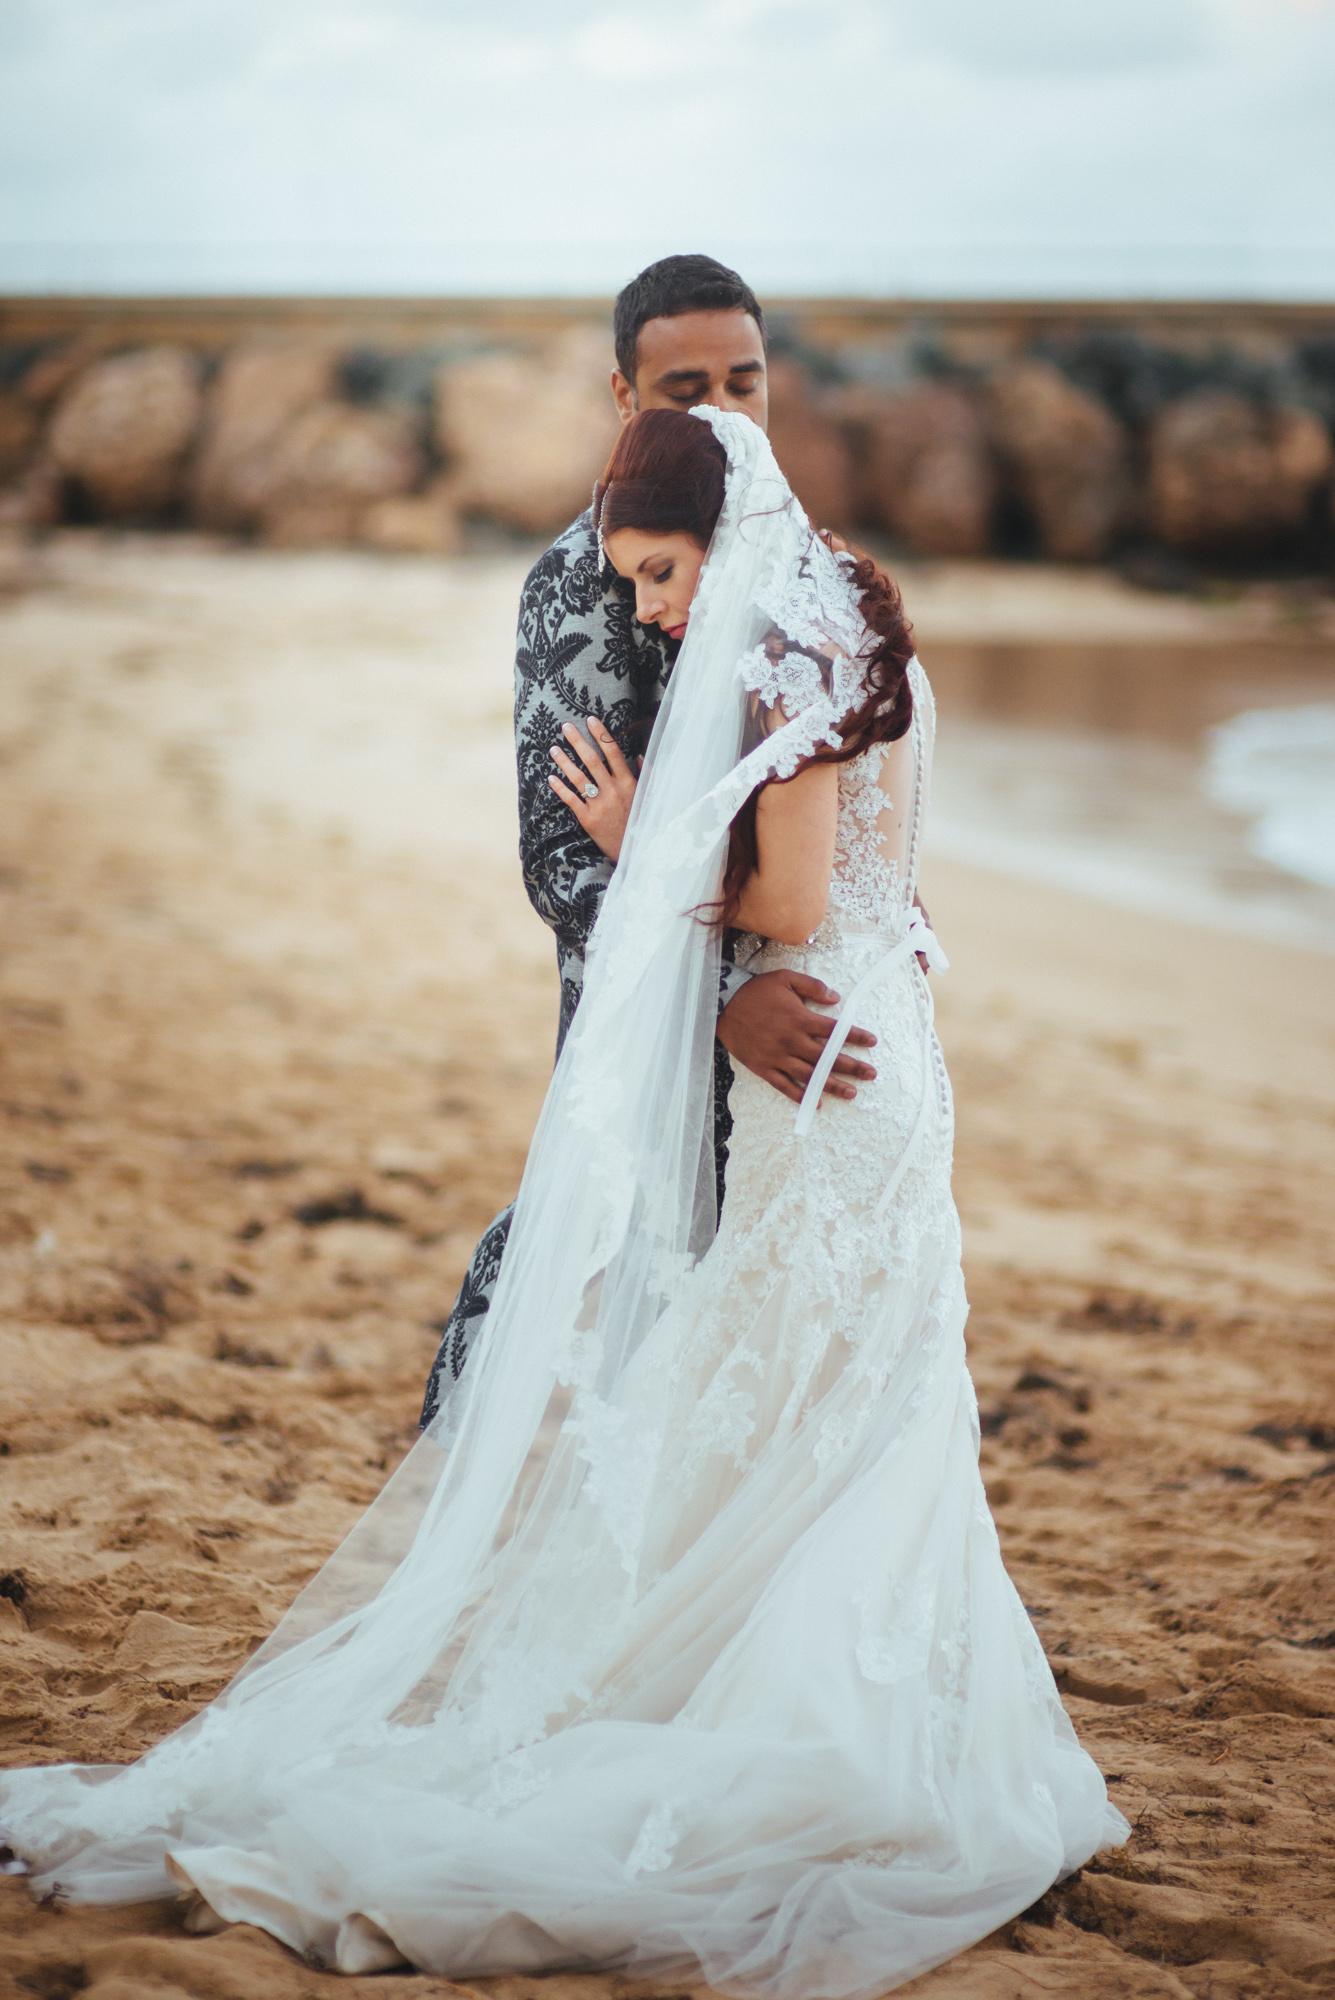 Puerto Rico Wedding Photography Destination Photographer Boris Zaretsky San Juan PRALI_9435.jpg